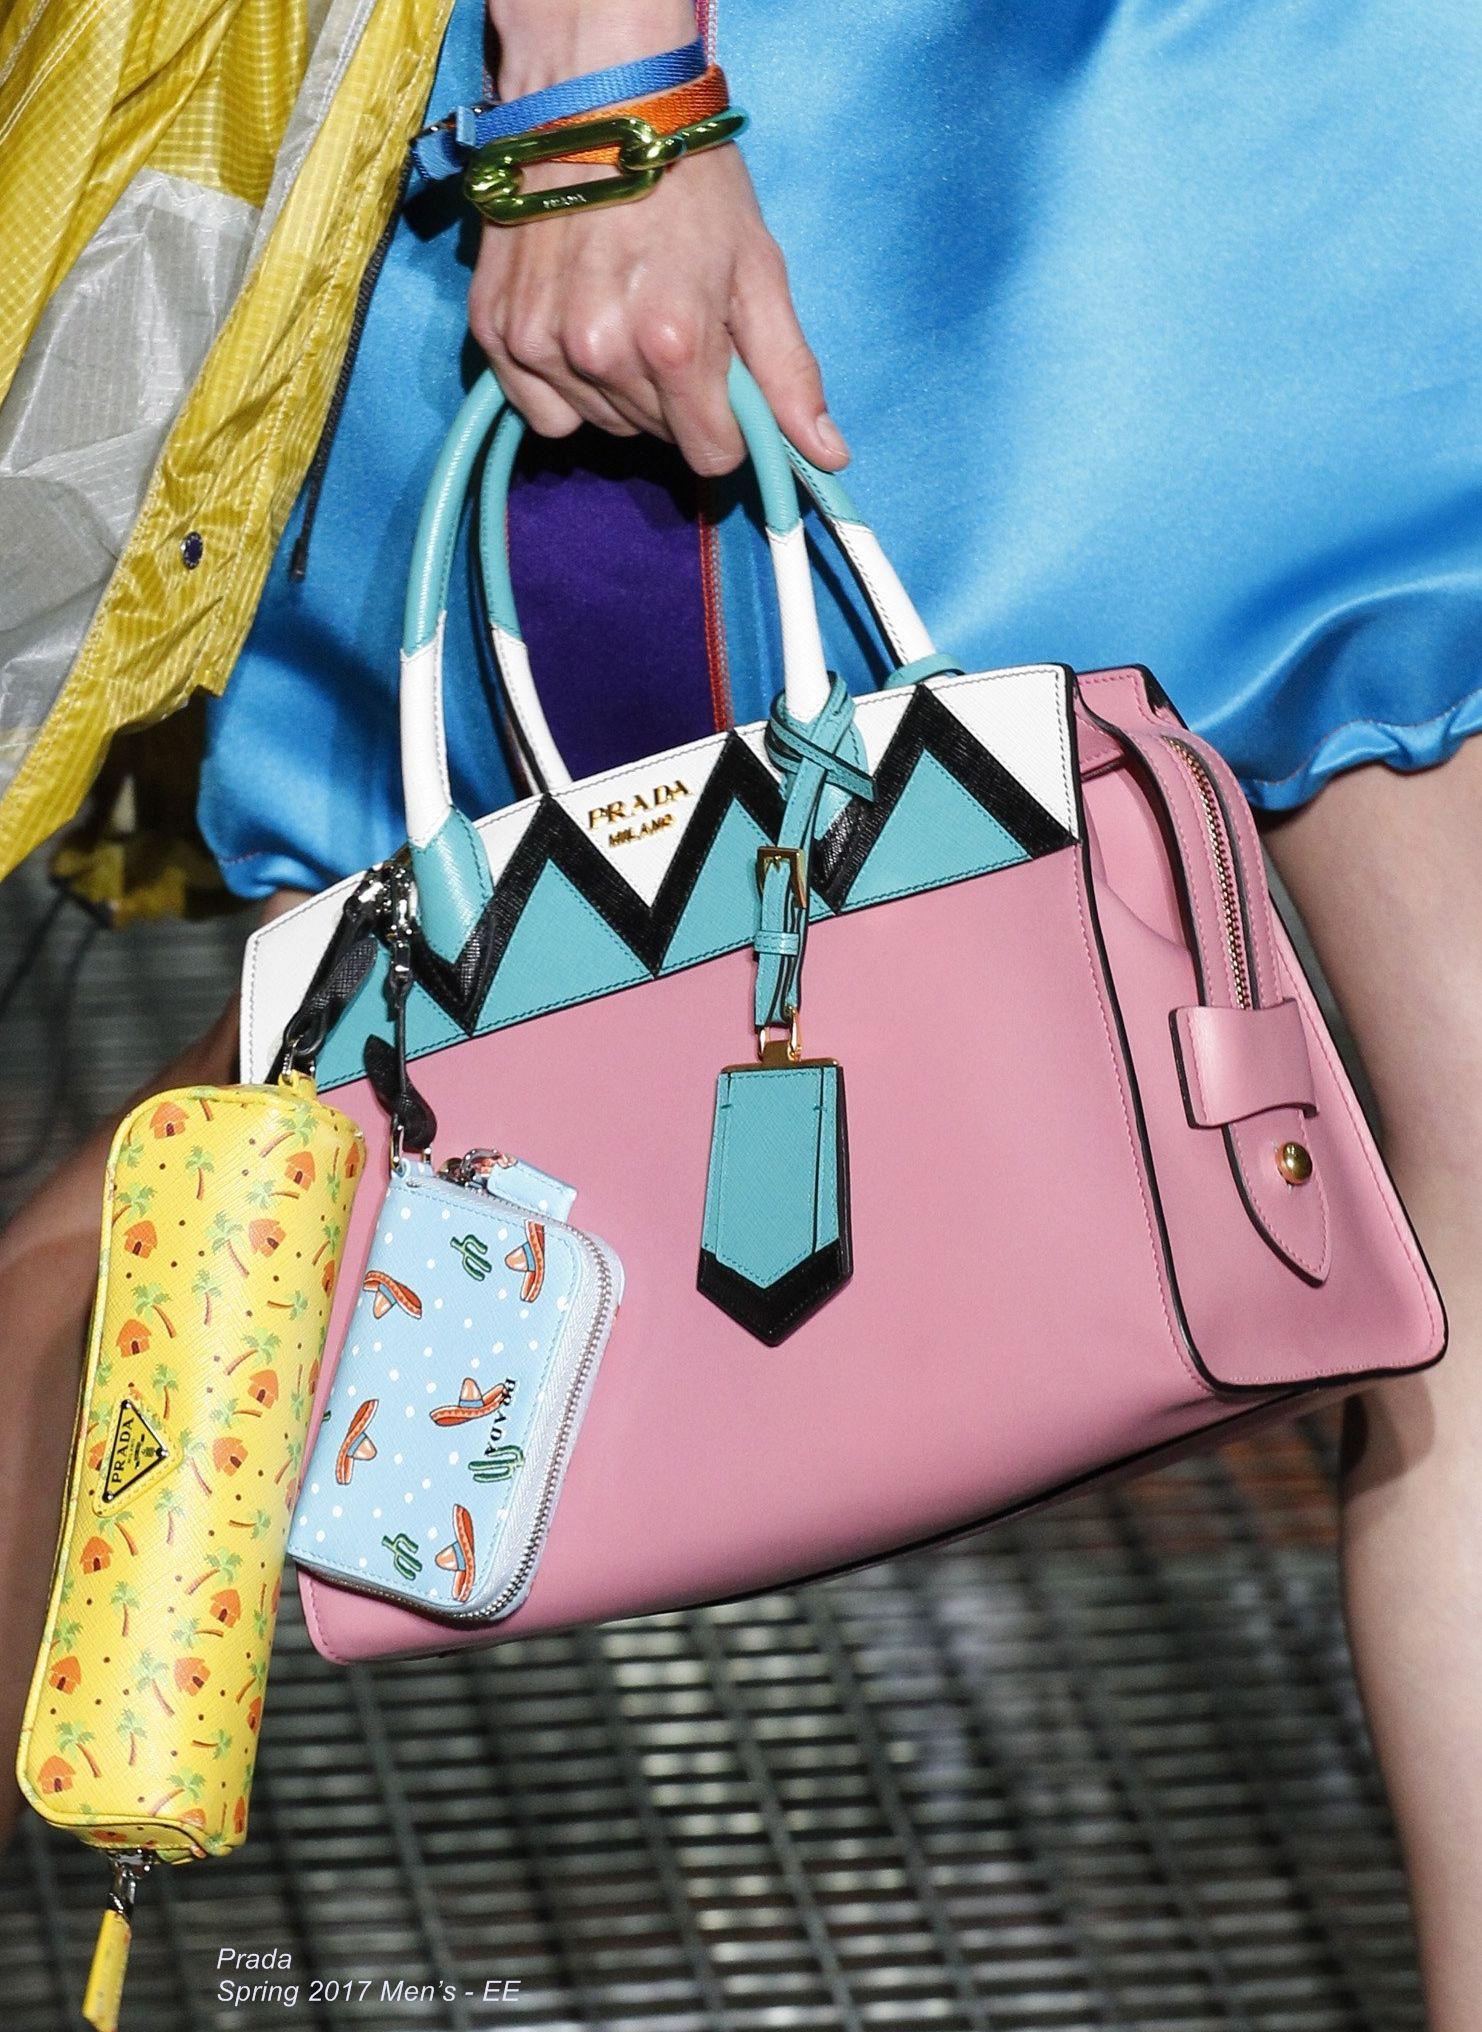 413c8218355d Prada Spring 2017 Women's Handbags & Wallets - amzn.to/2iZOQZT Women's  Handbags